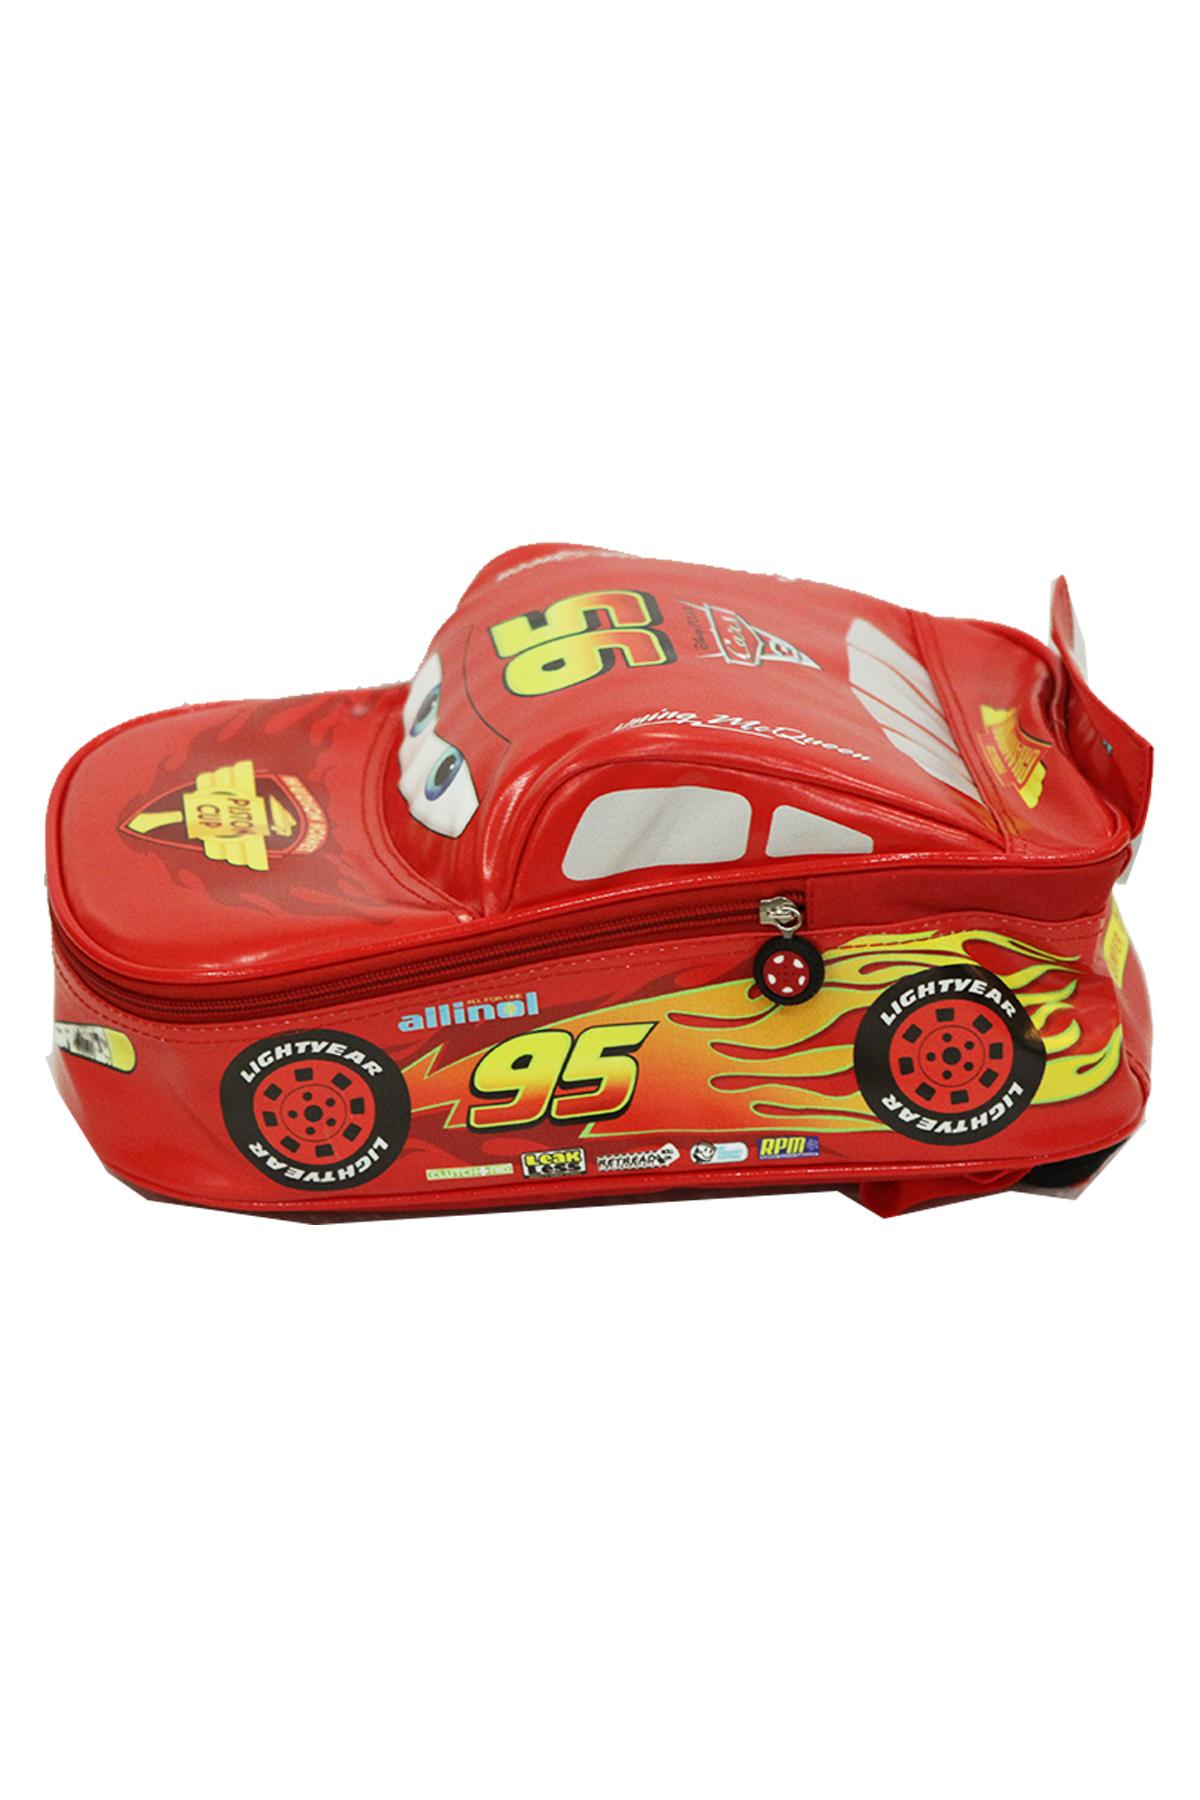 Jual Tas Ransel Sekolah Anak TK Cars On The Road 3D TK